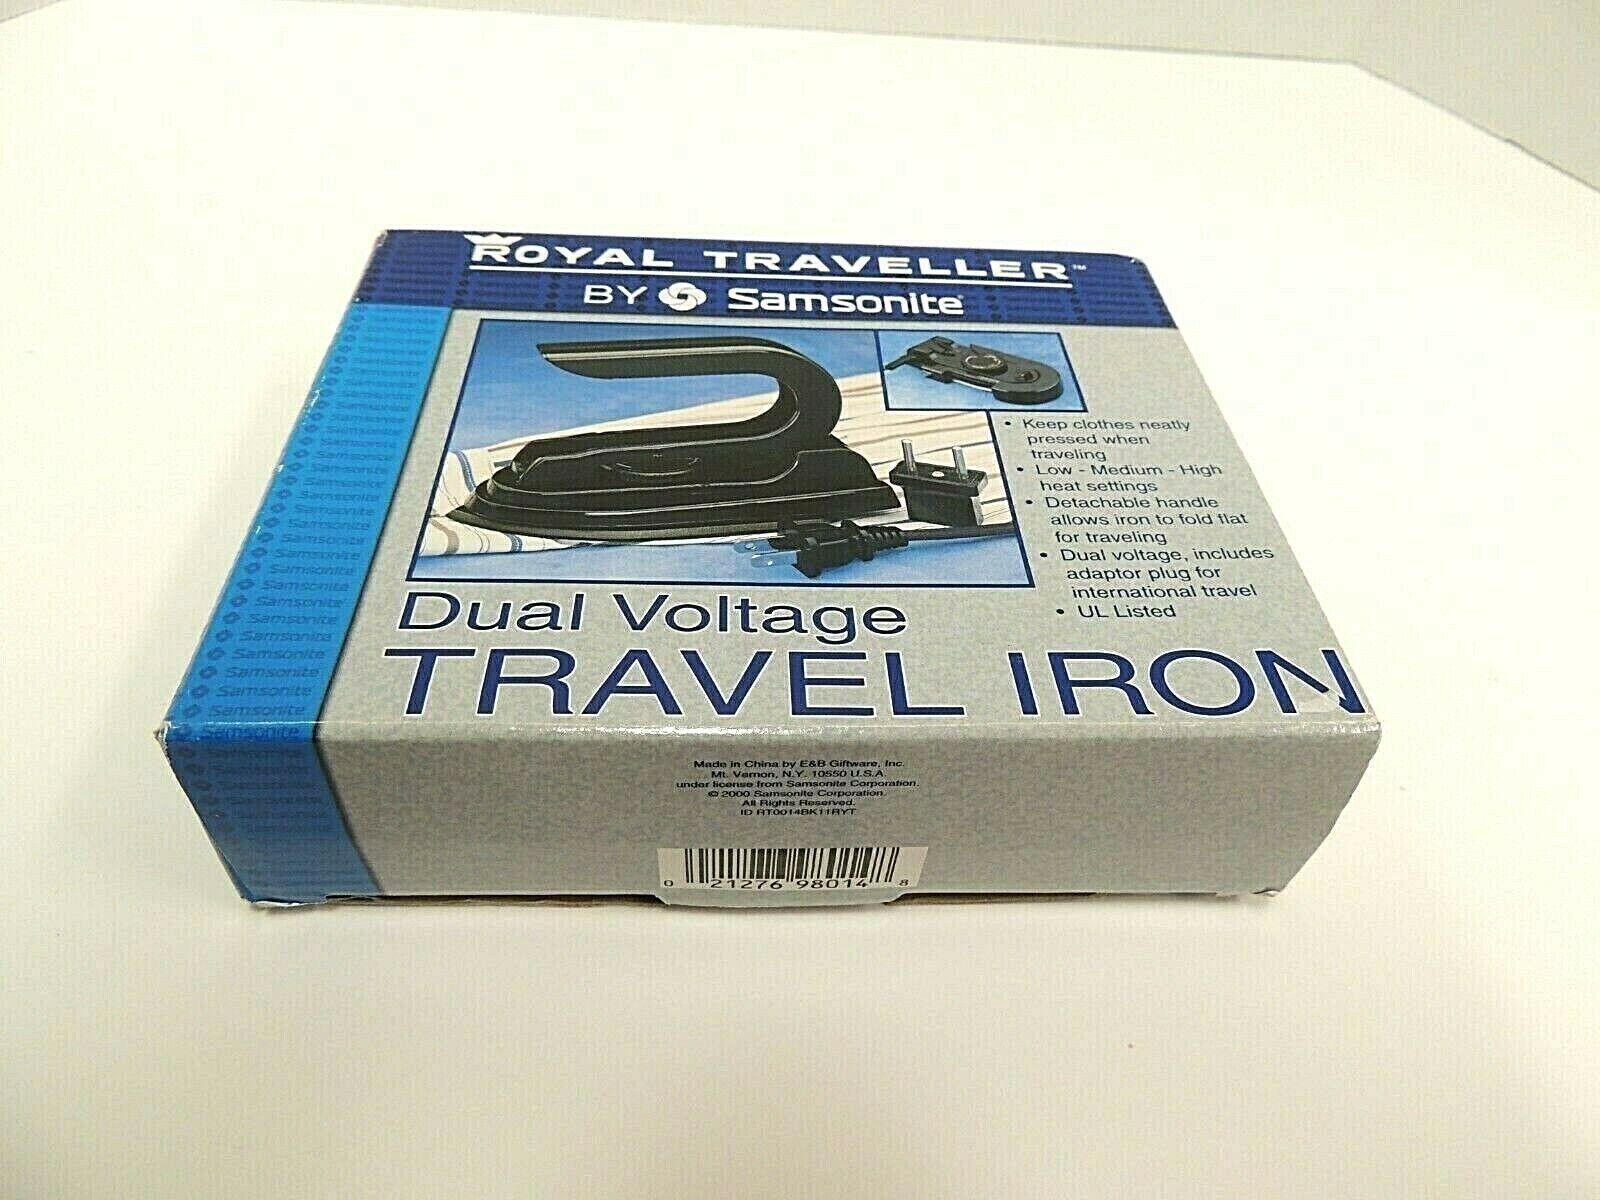 Travel Iron Royal Traveller By Samsonite Dual Voltage Brand New RT0014BK - $21.95